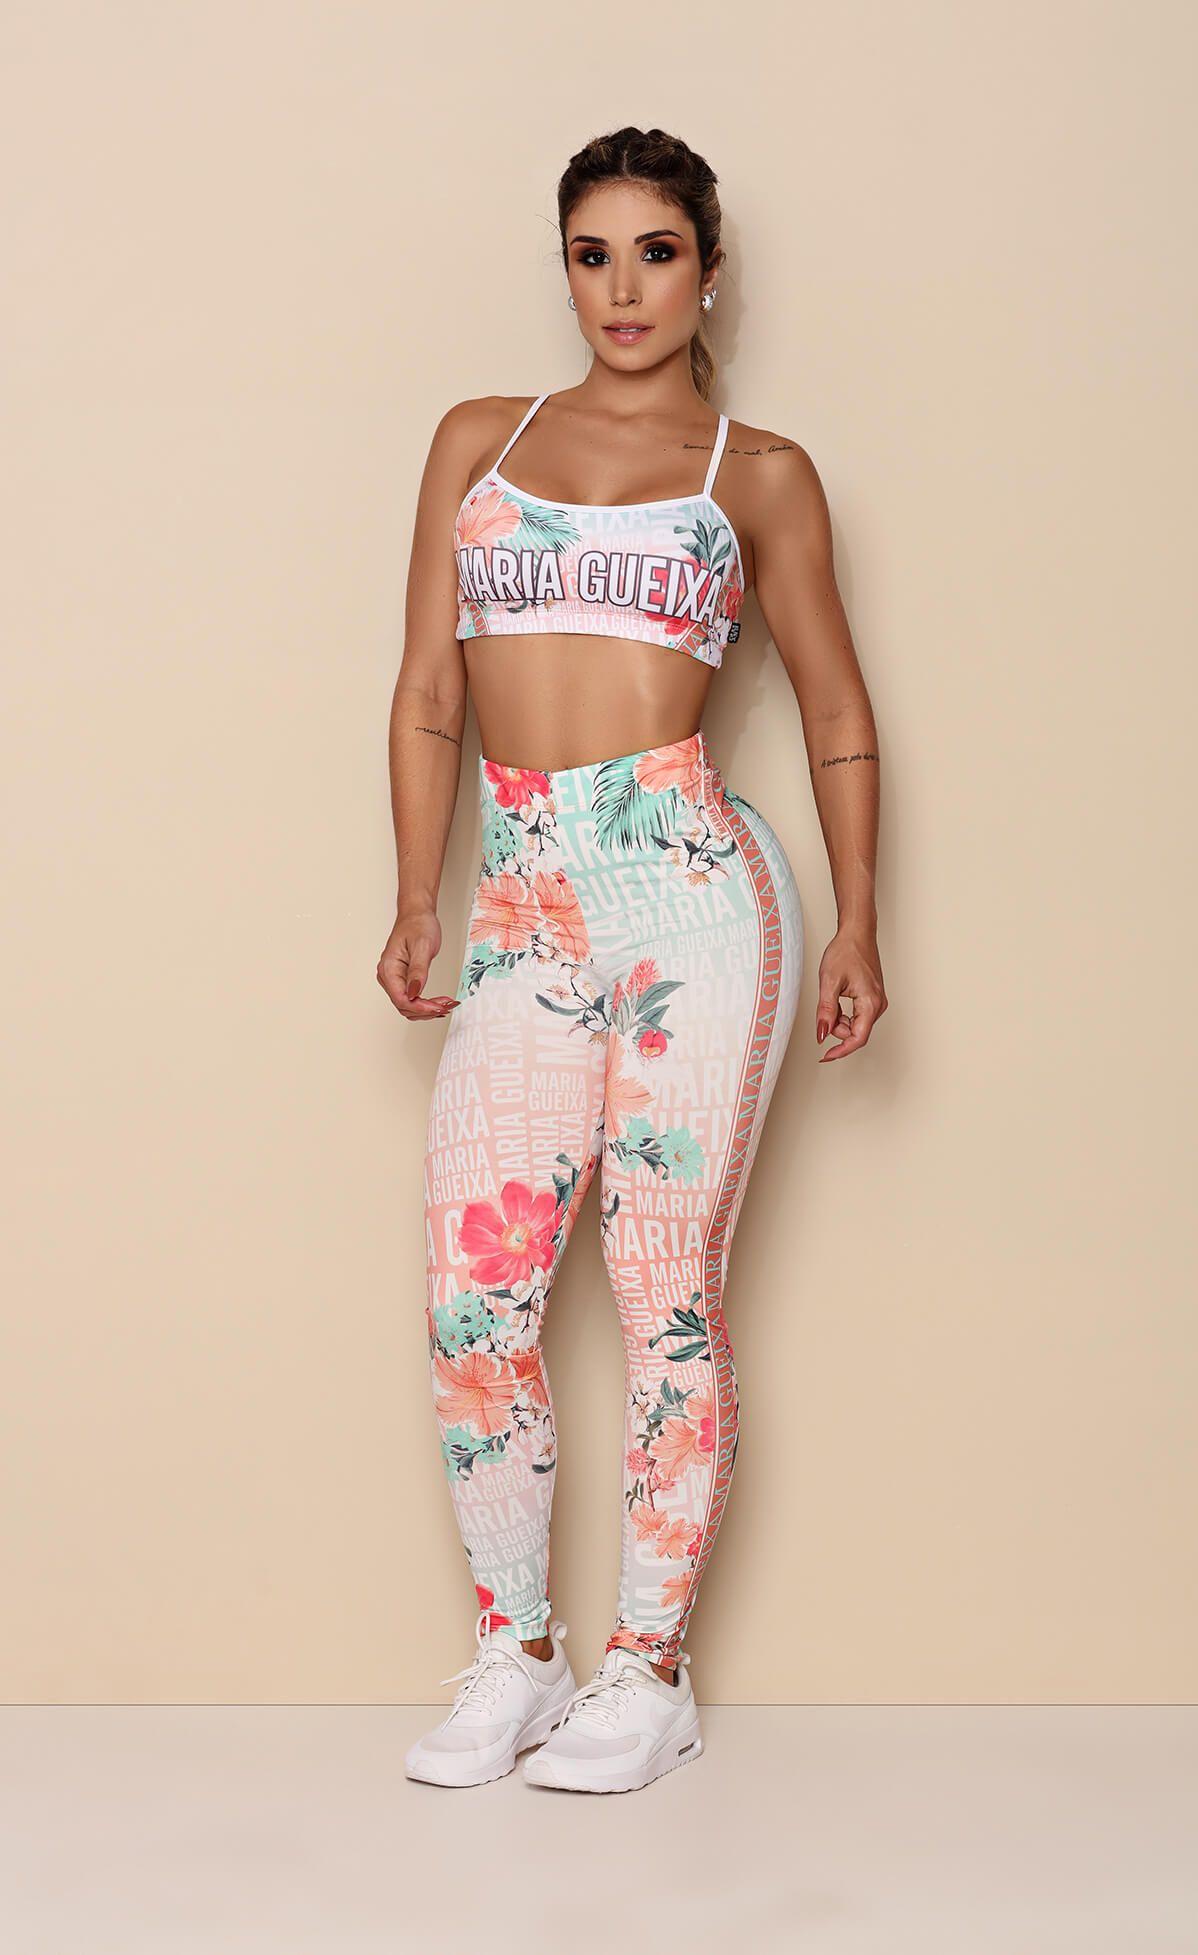 Conjunto Top + Legging Printed Candy Gloss Logomania Maria Guei Candy Gloss